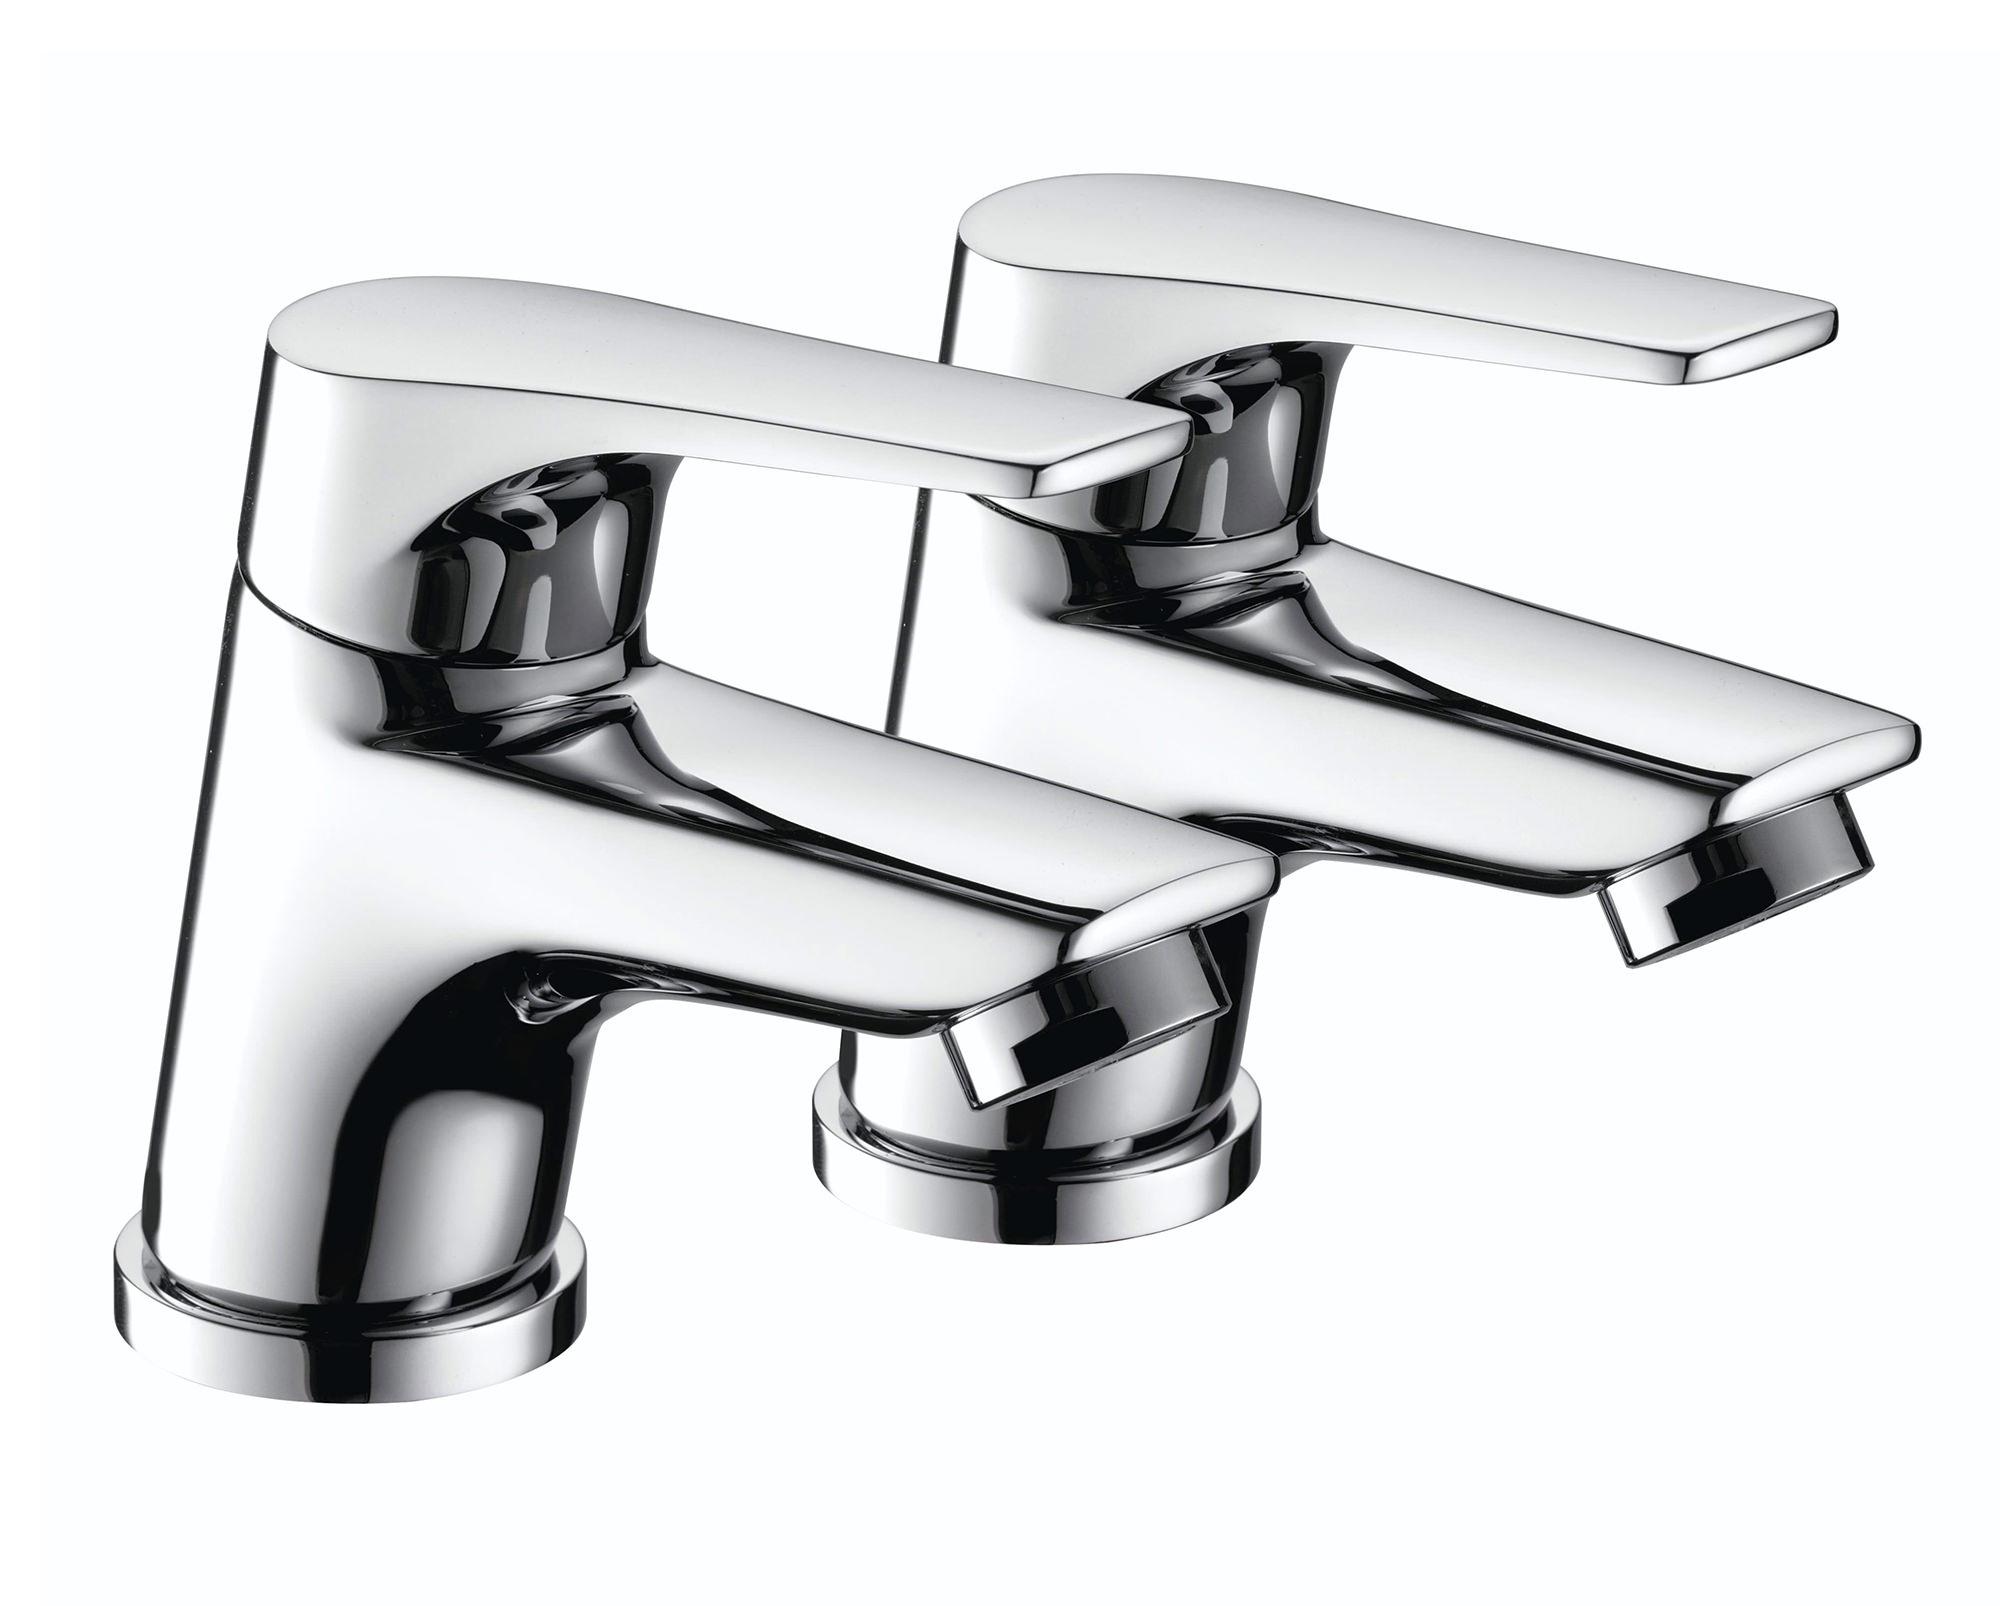 Chrome Bristan Kitchen Taps: Bristan Vantage Chrome Half Inch Basin Taps